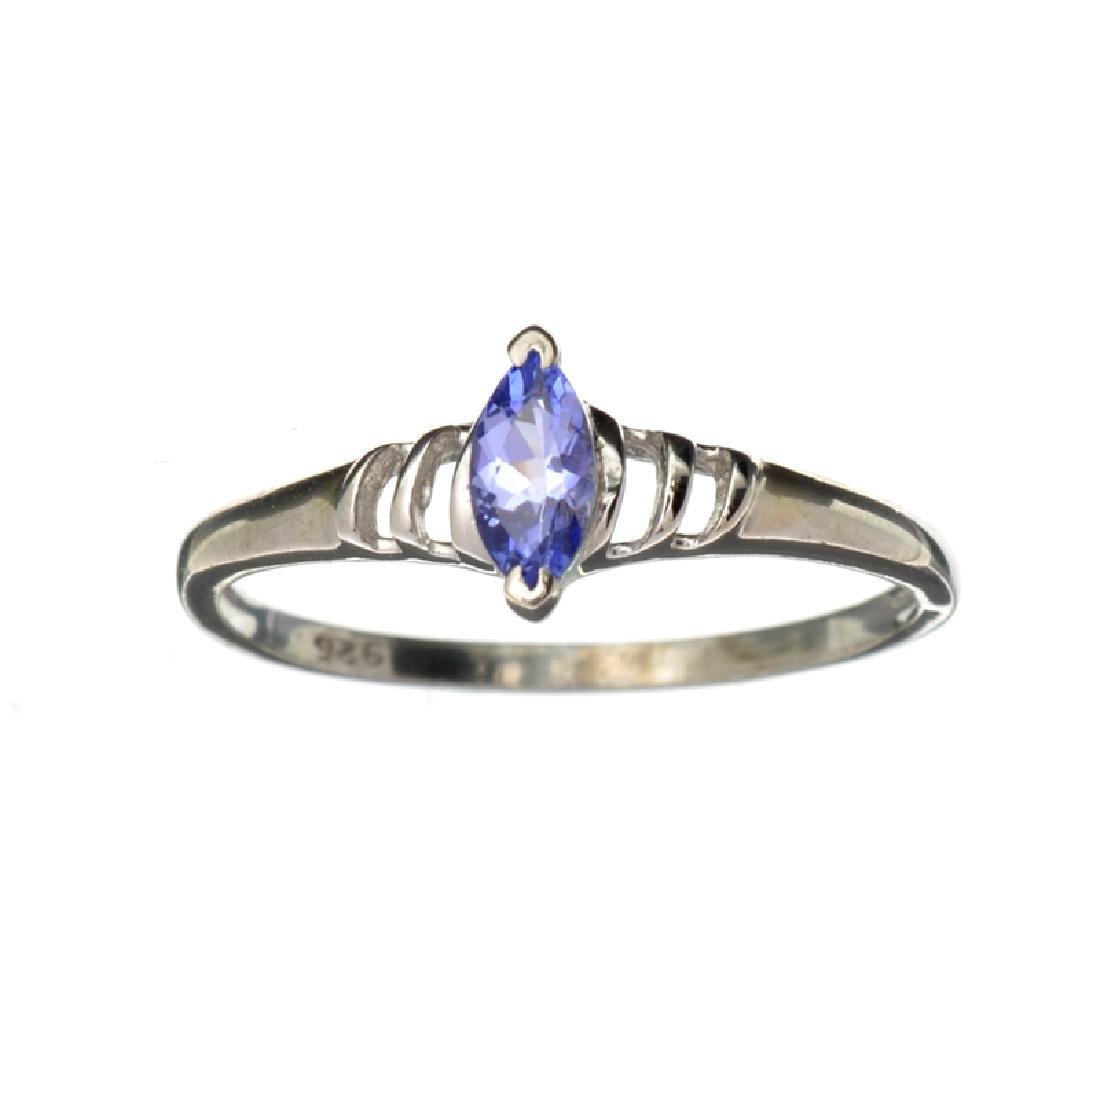 APP: 0.8k Fine Jewelry 0.35CT Marquise Cut Tanzanite